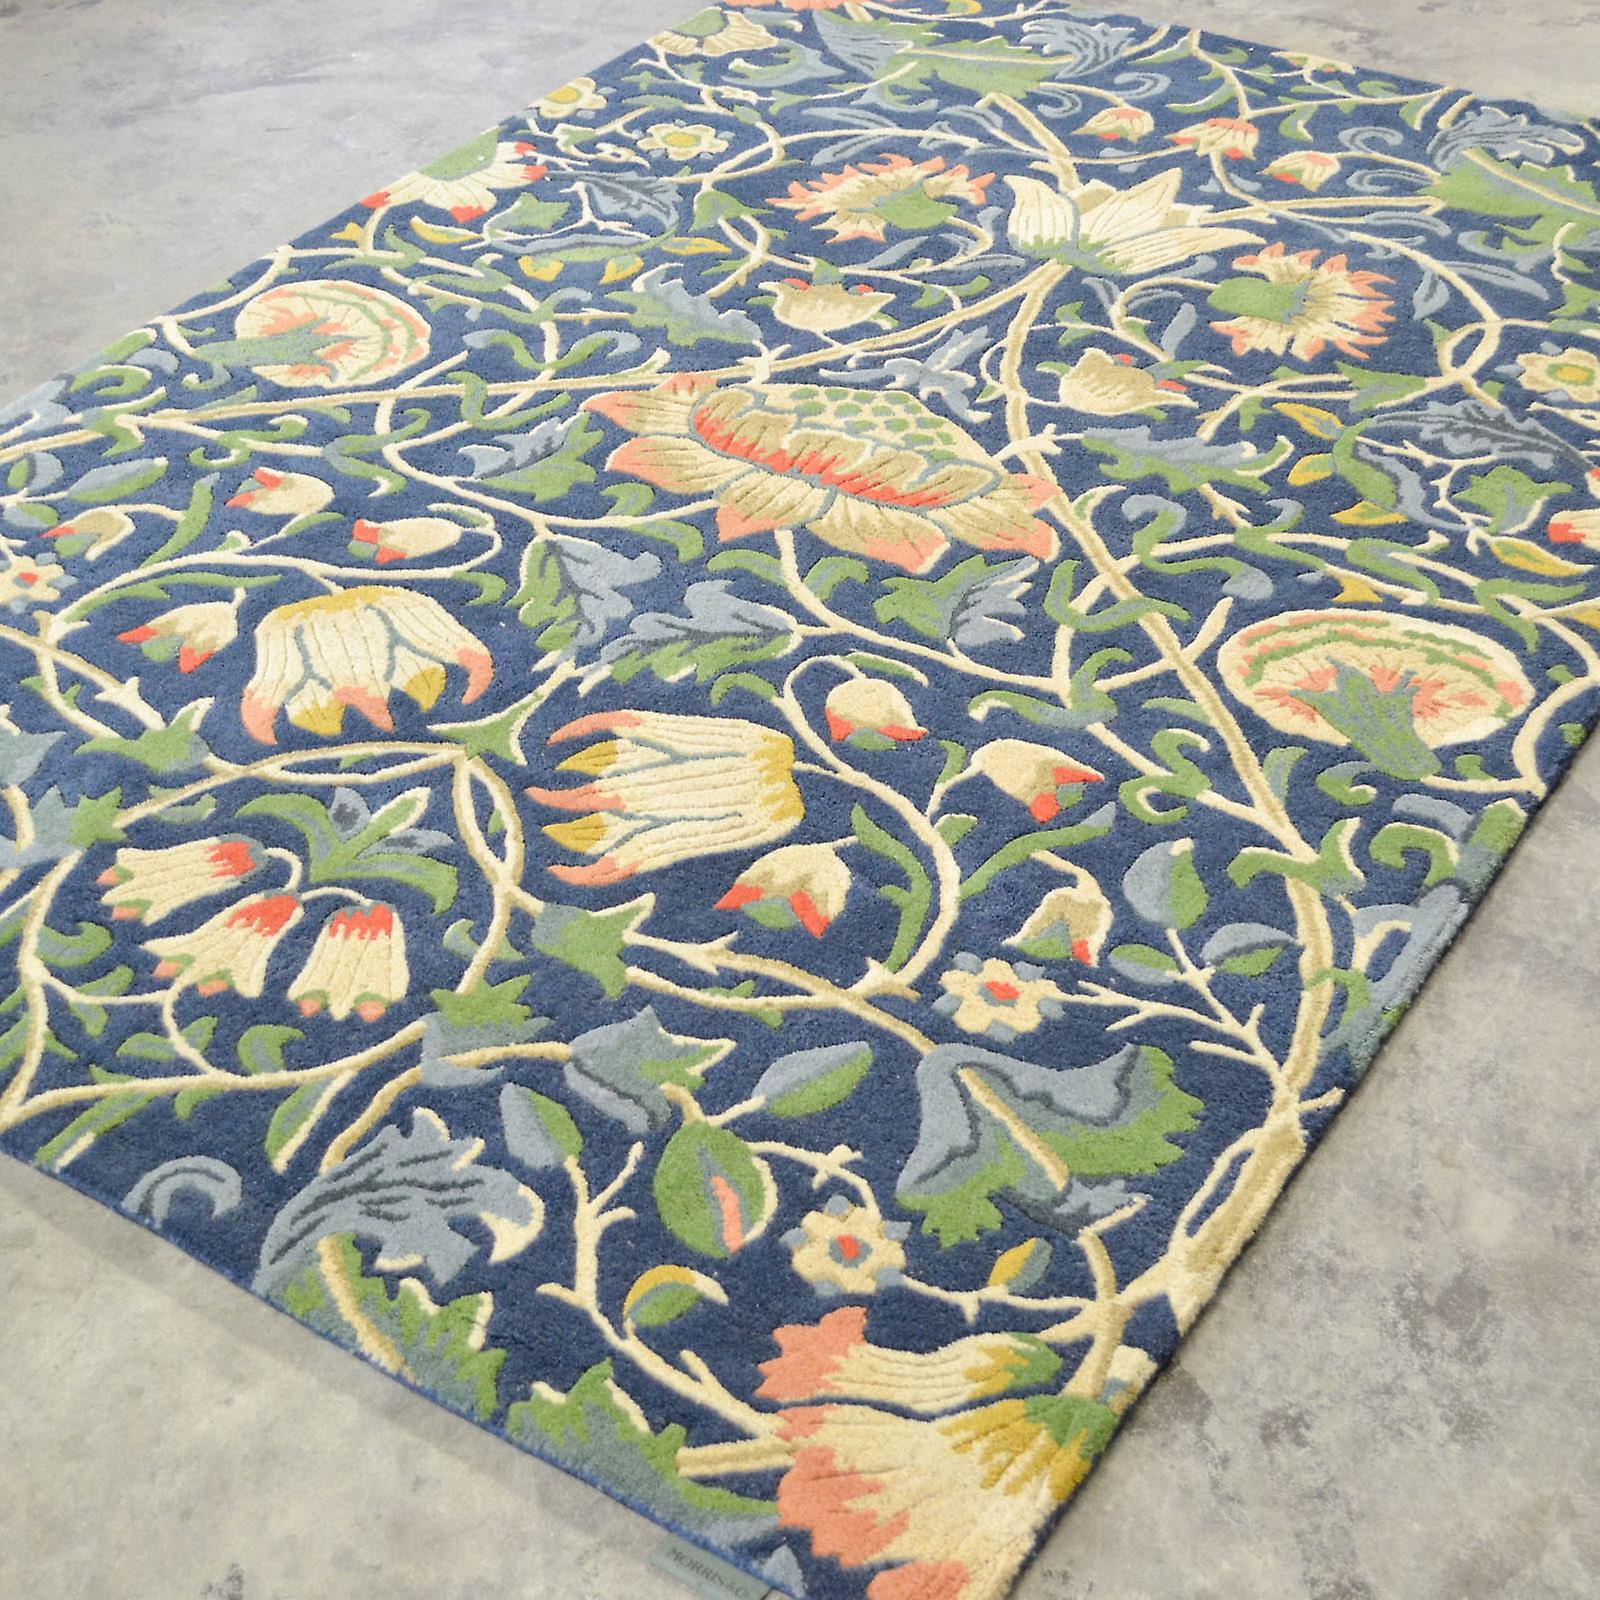 Lodden tapis 27808 Indigo et minérale par William Morris